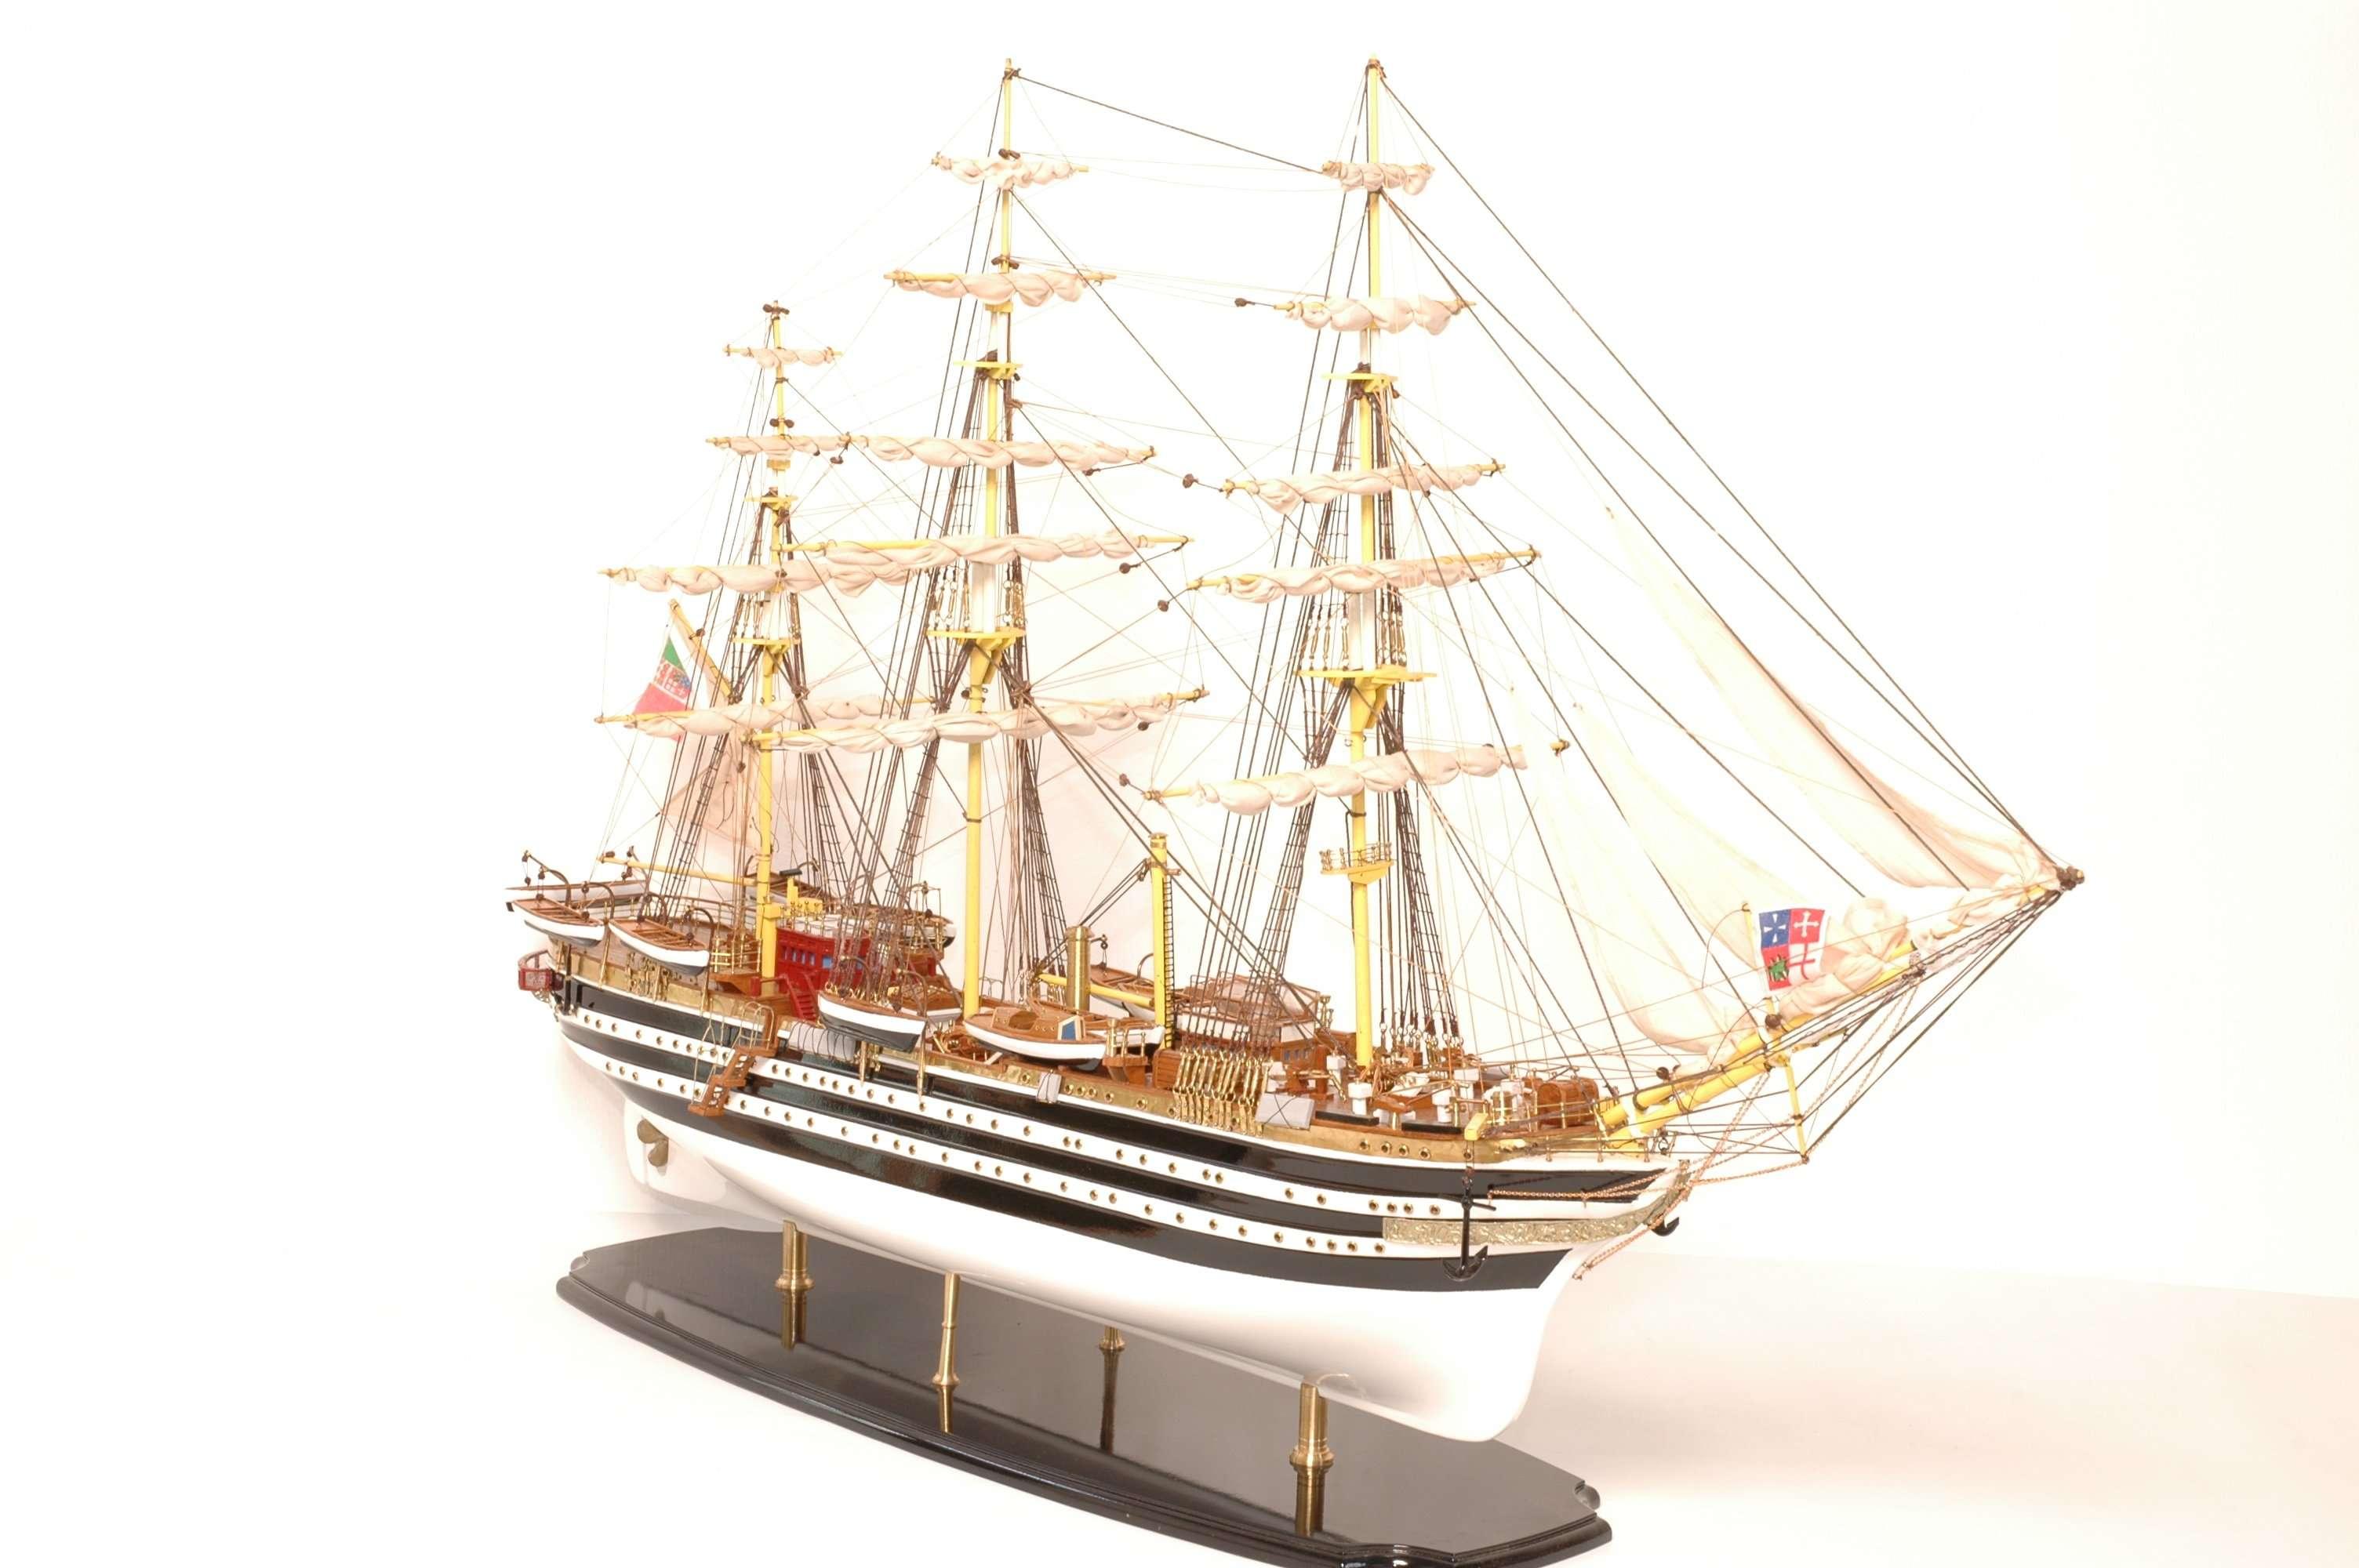 498-4211-Amerigo-Vespucci-Model-Ship-Superior-Range